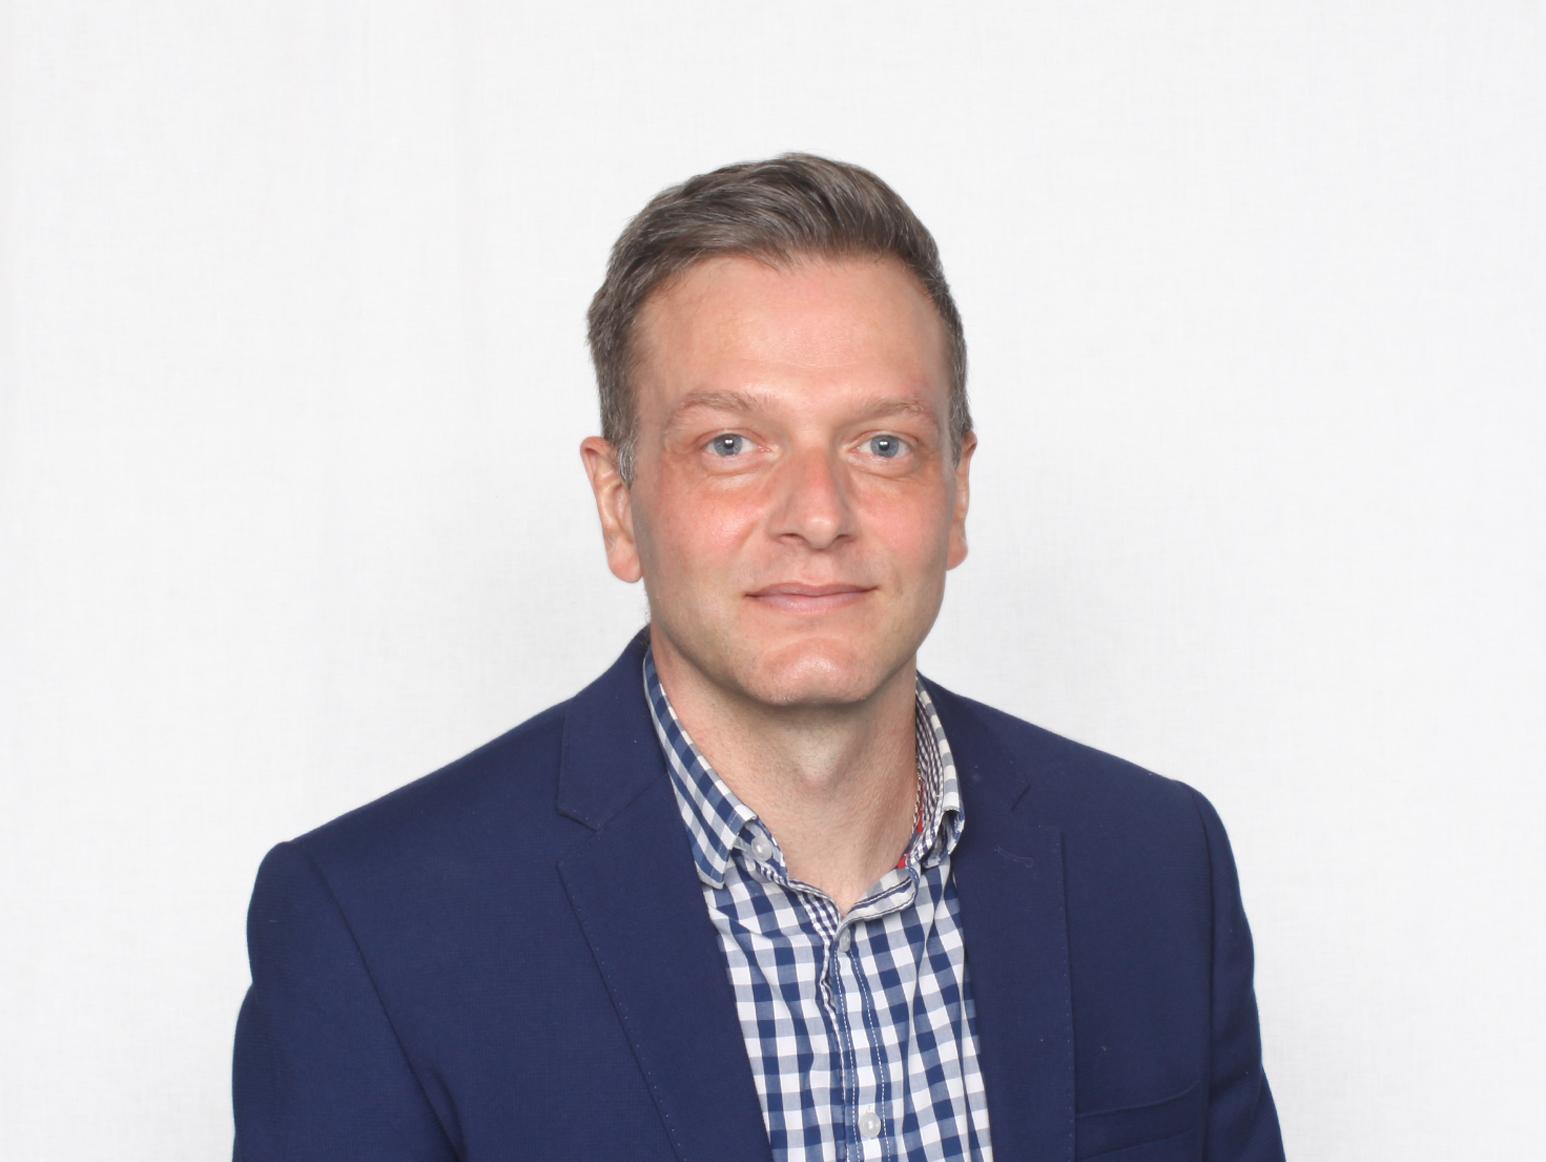 Hannes Venter